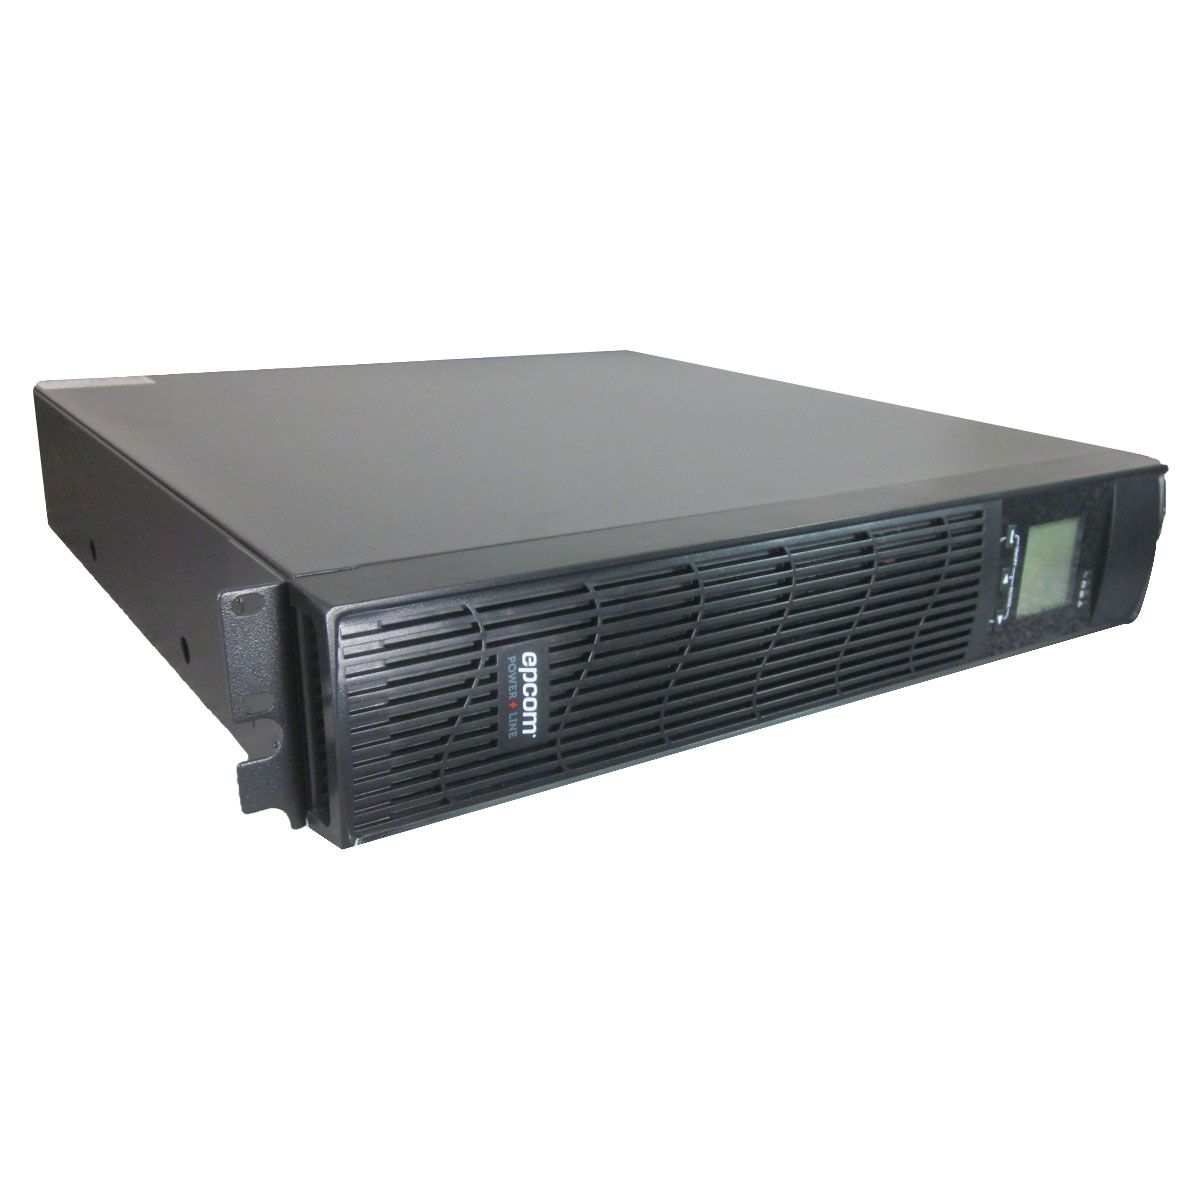 UPS de alta densidad Epcom de 1000 VA / 900 W